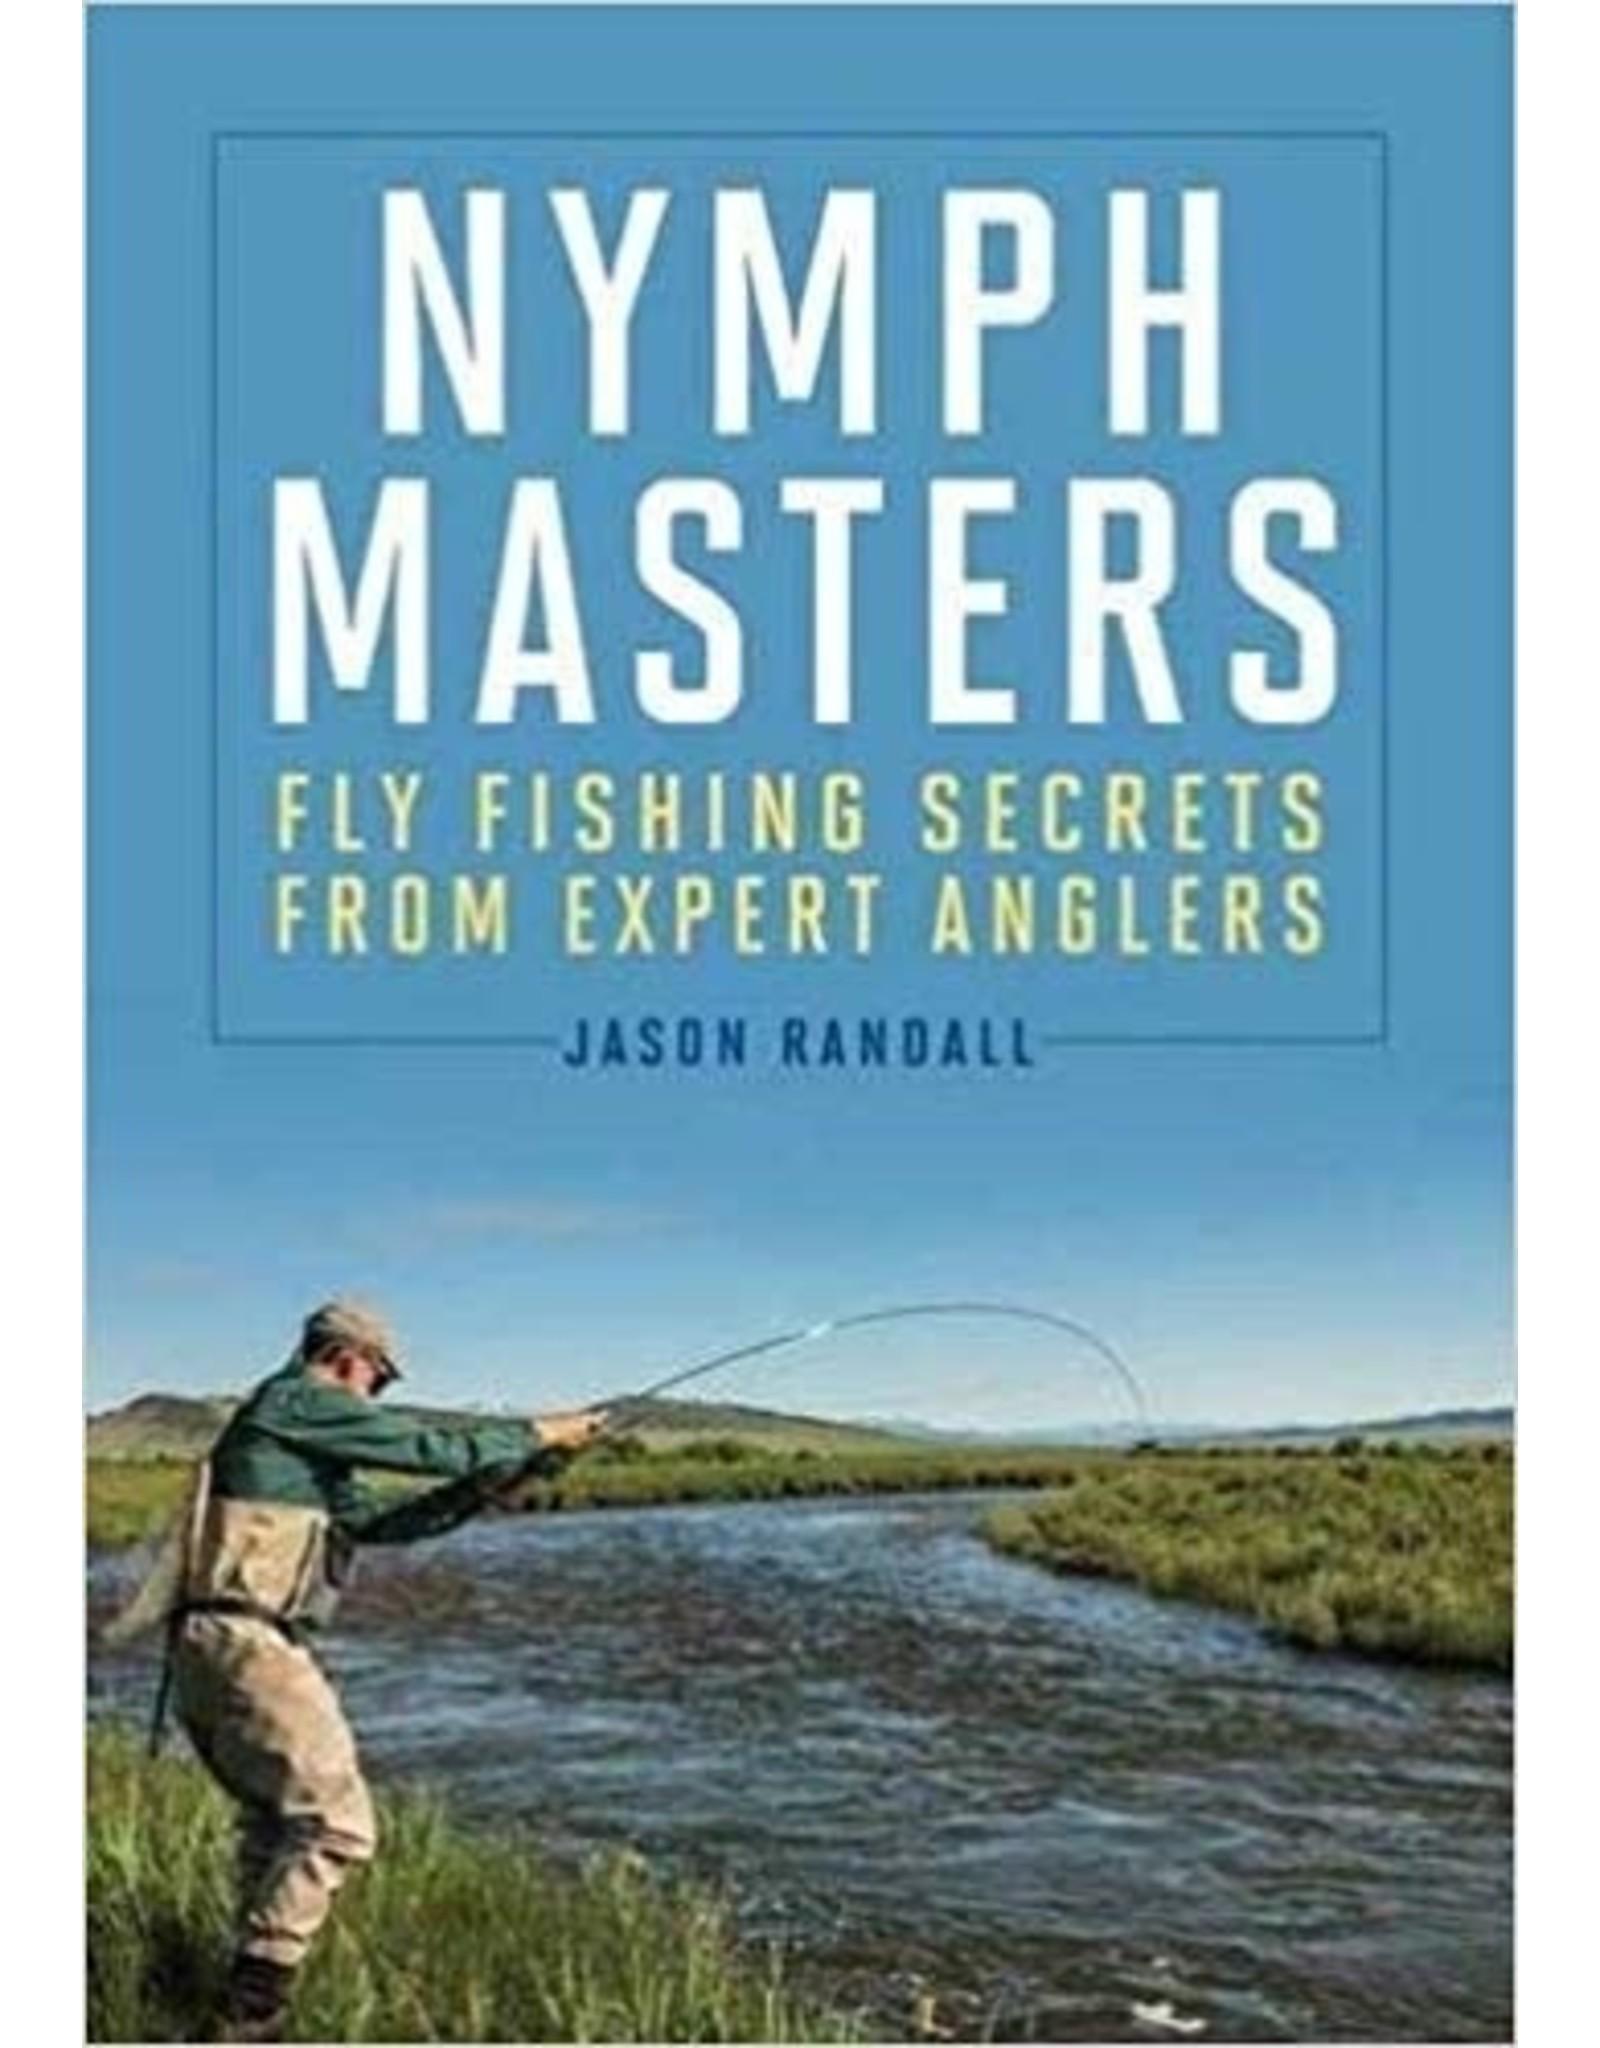 Books Nymph Masters by Jason Randall